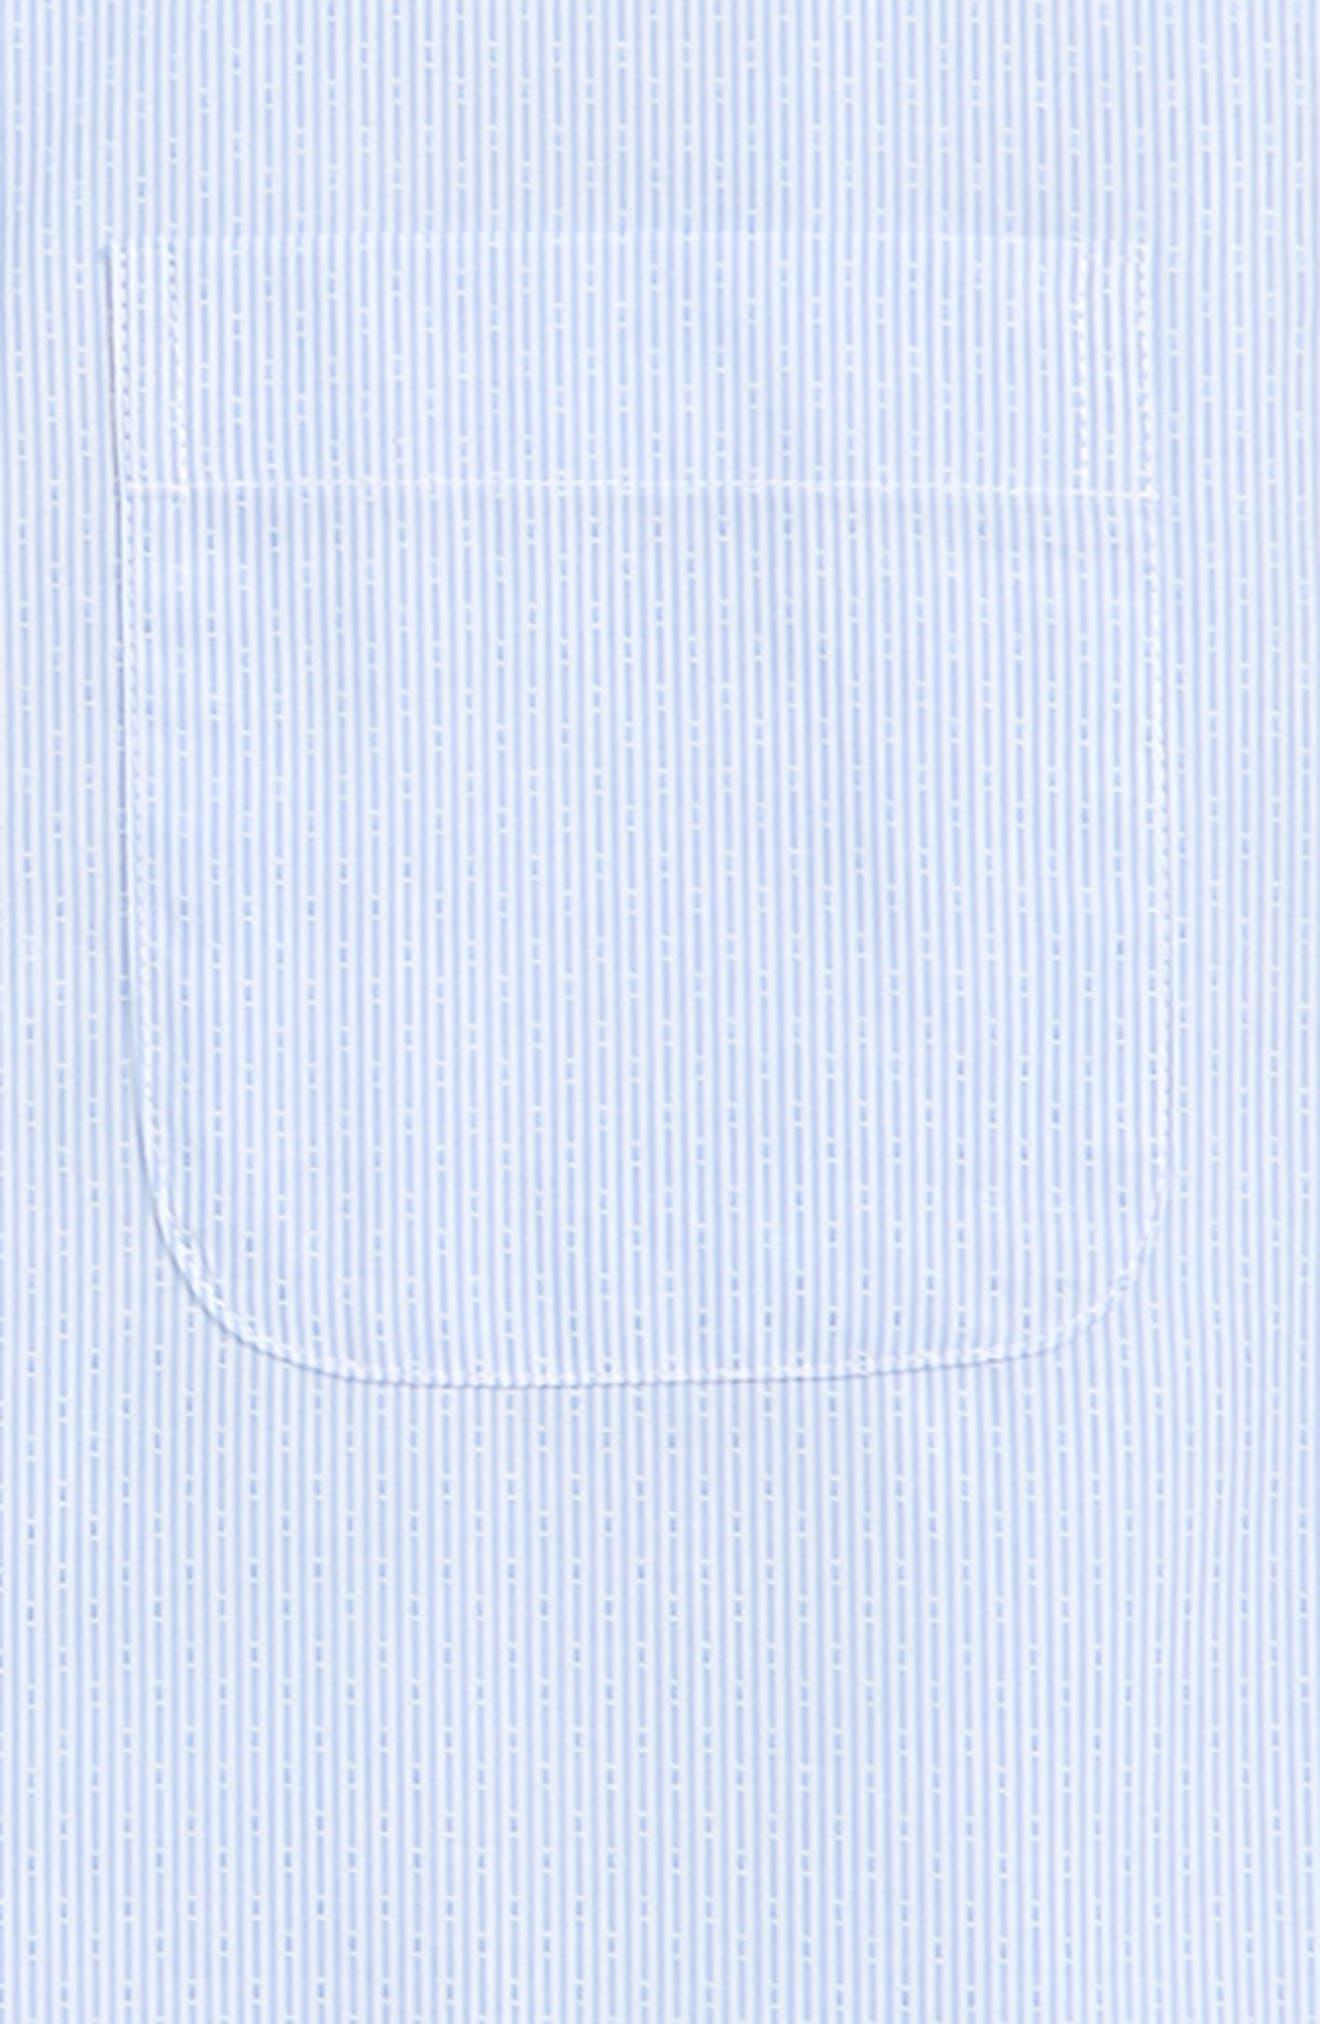 Robbia Dobby Dress Shirt,                             Alternate thumbnail 2, color,                             Blue Robbia- White Dobby